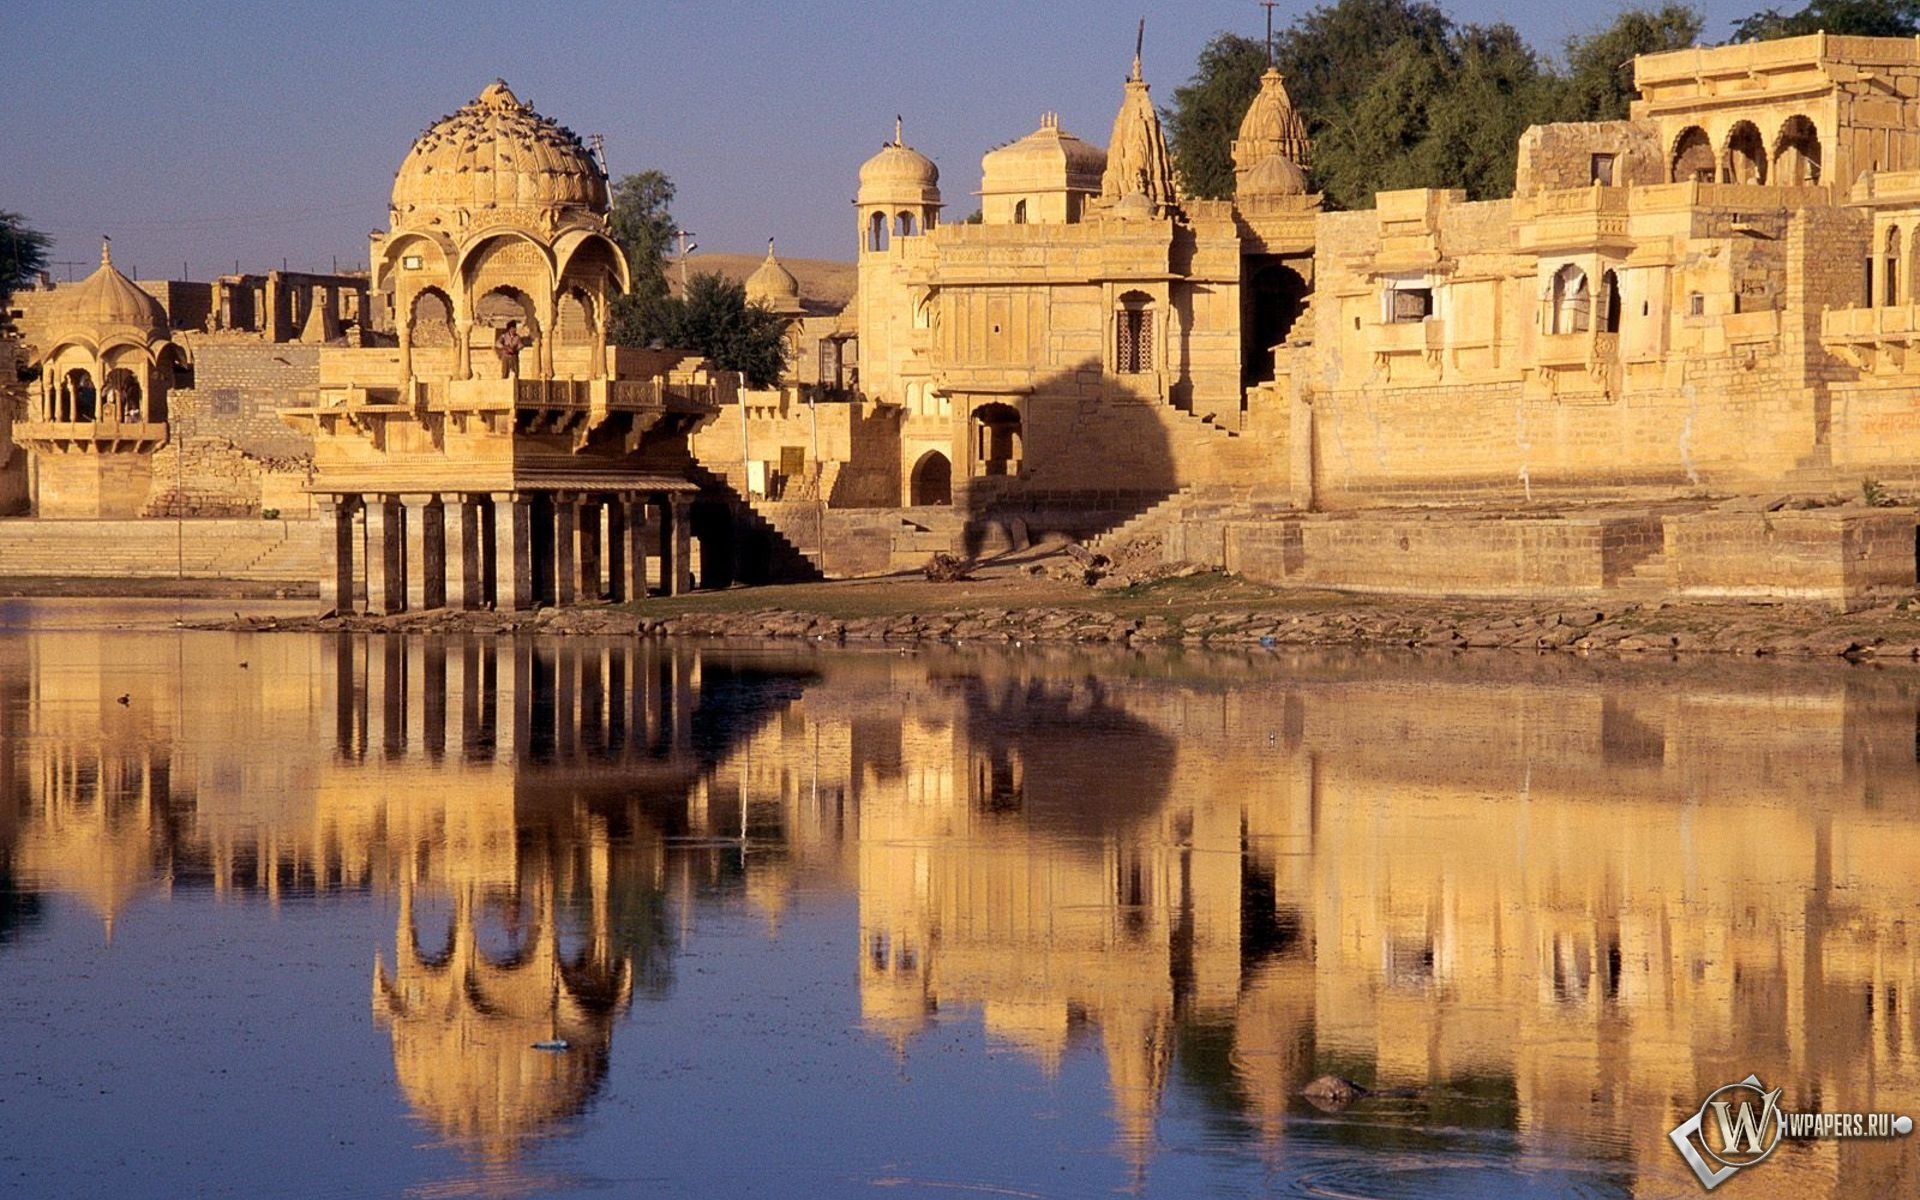 Jaisalmer - Rajasthan - India  1920x1200